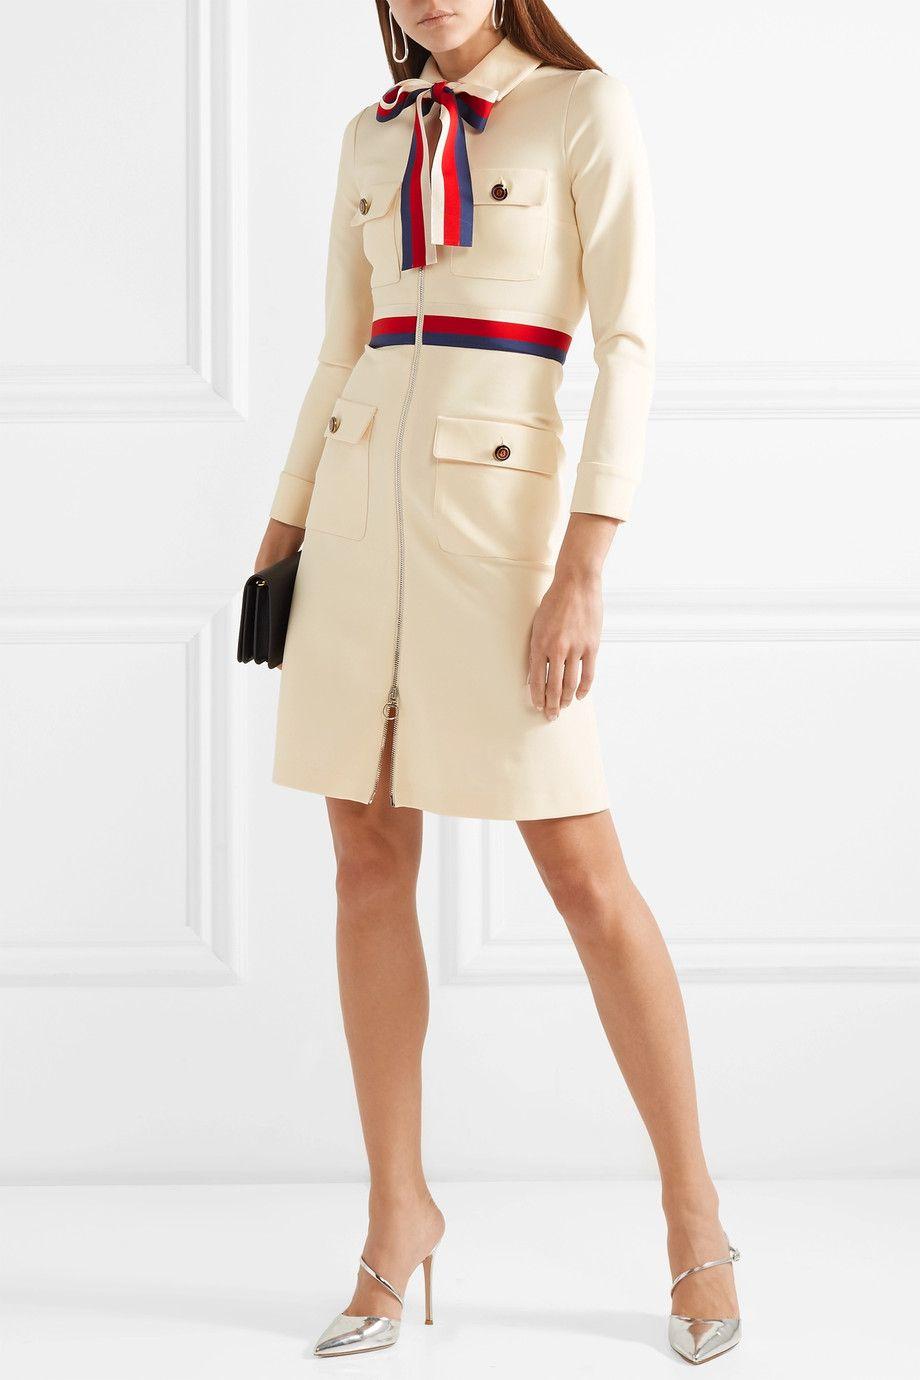 Gucci   Grosgrain-trimmed jersey mini dress   Fashion Lust   Dresses ... 4803b5ec98ea